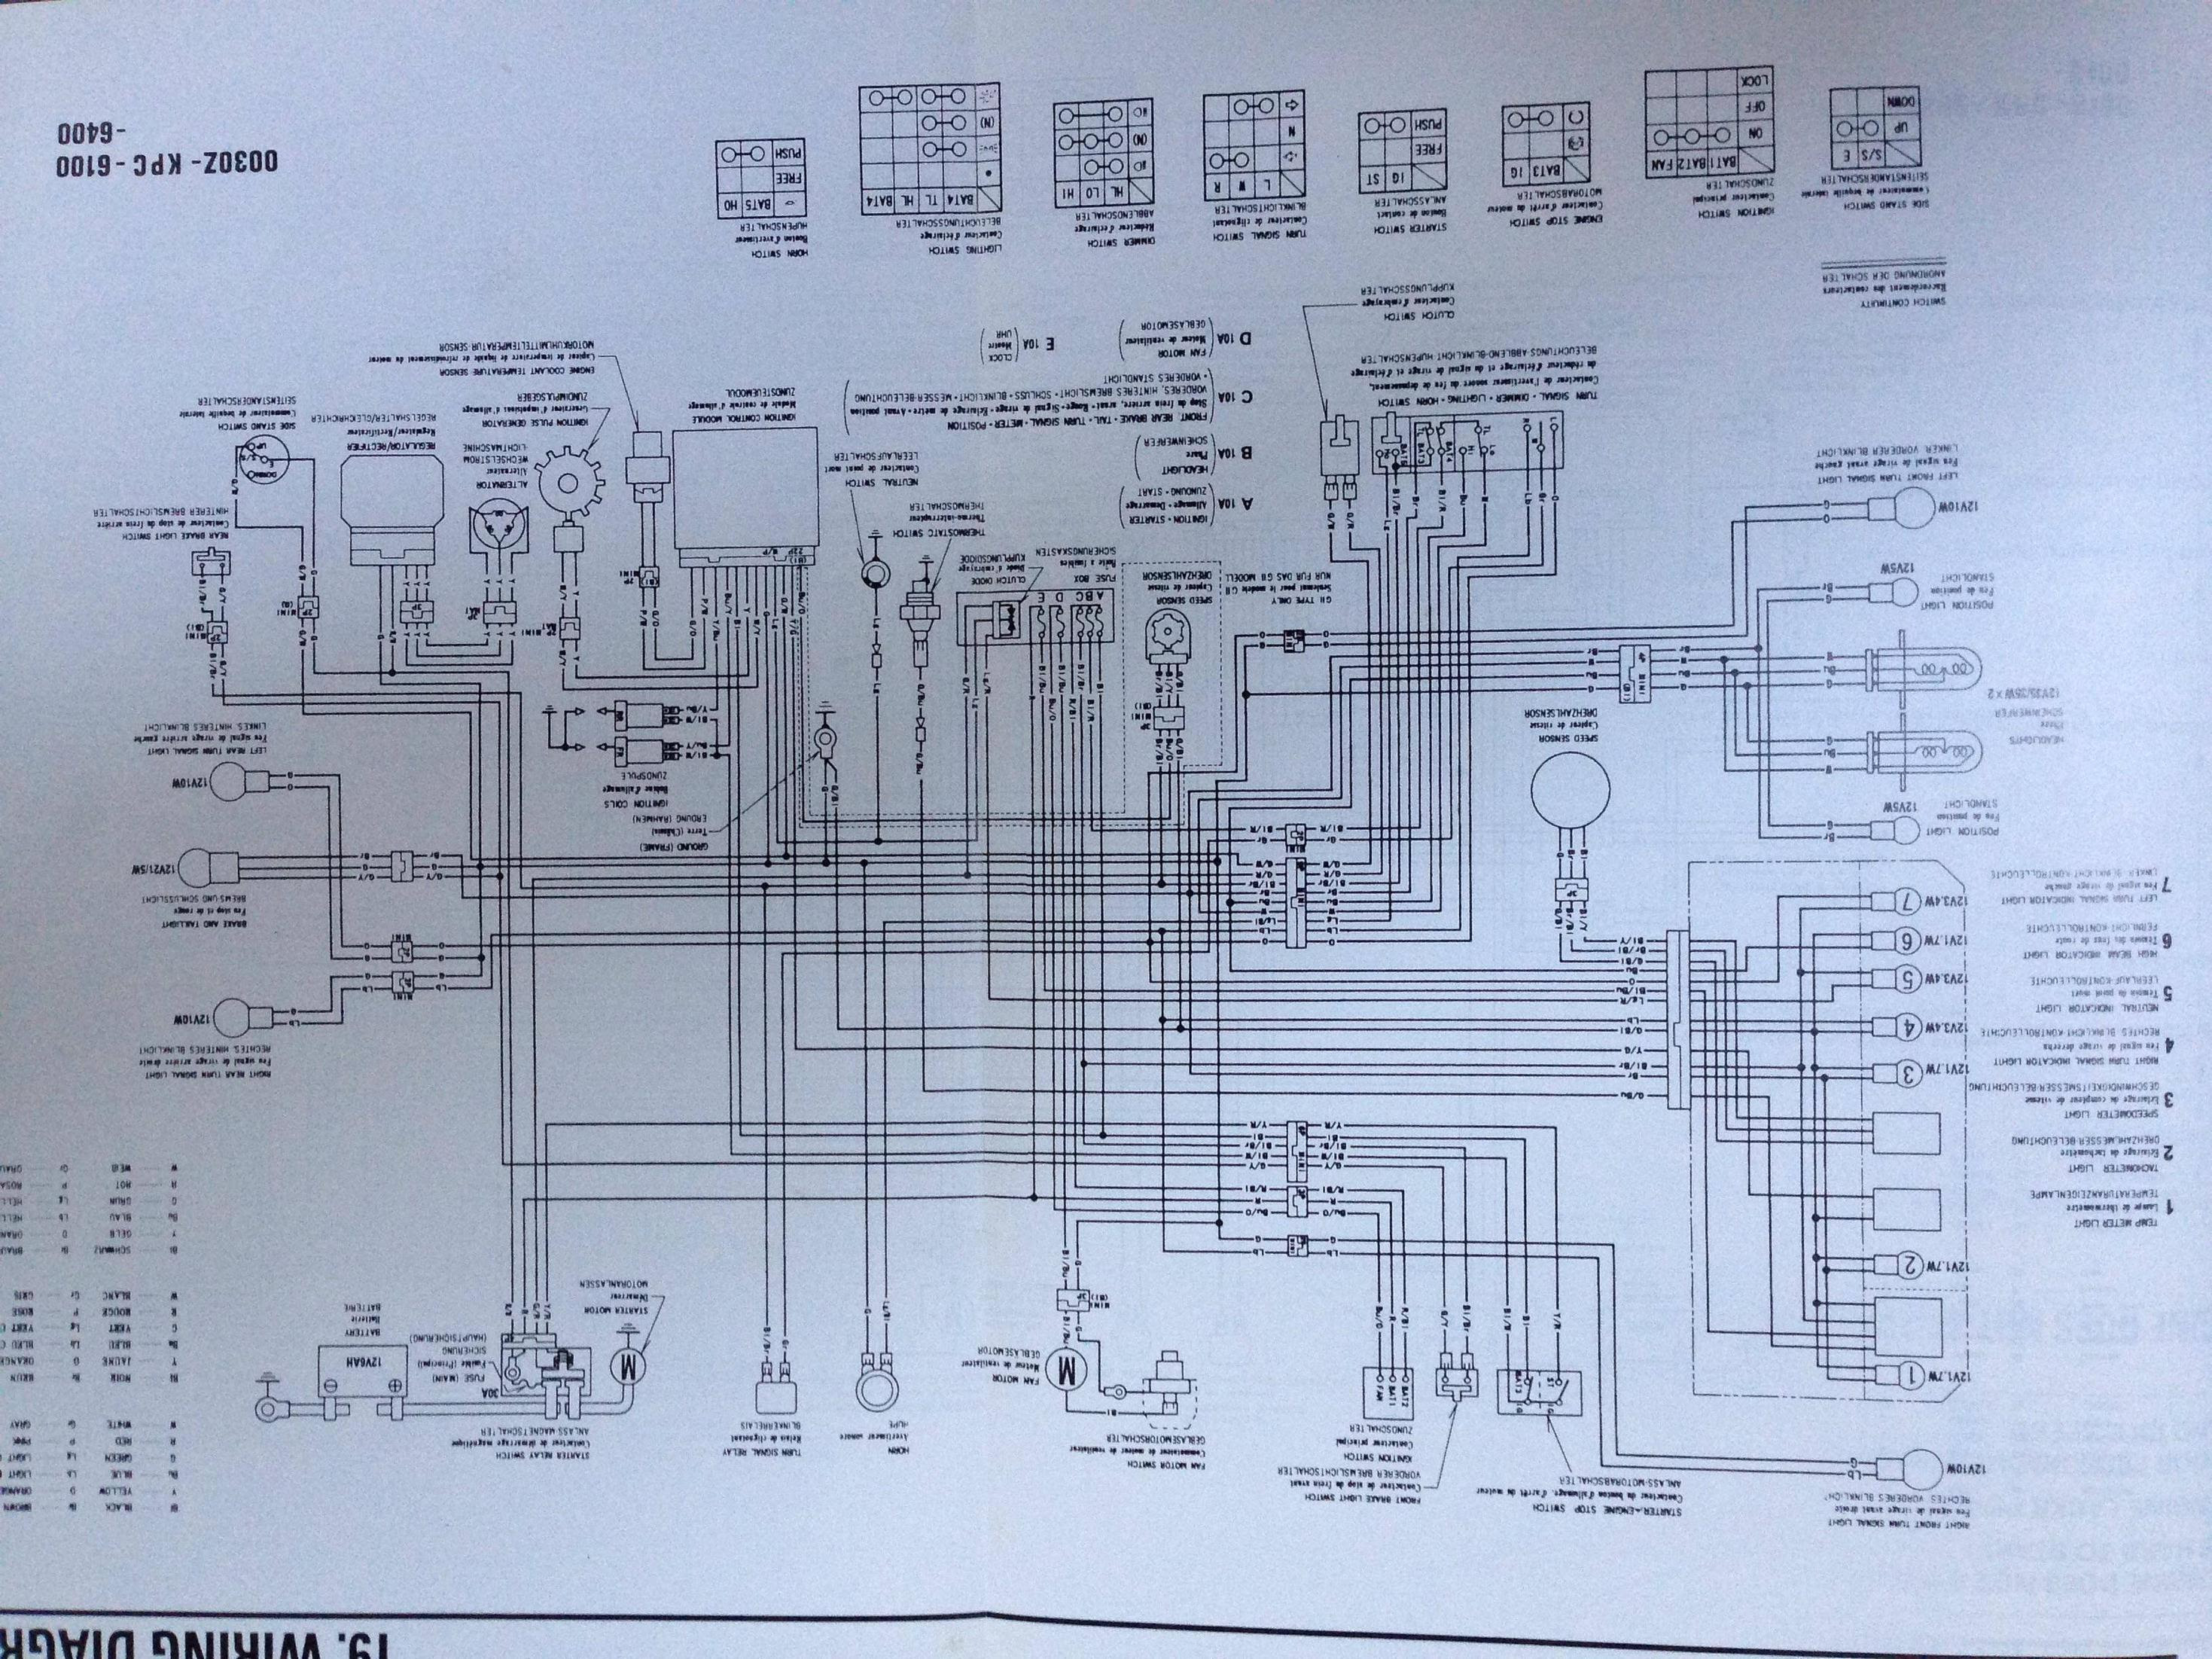 Diagram Honda Varadero Wiring Diagram Full Version Hd Quality Wiring Diagram Diagramwolfen Informazionihotel It